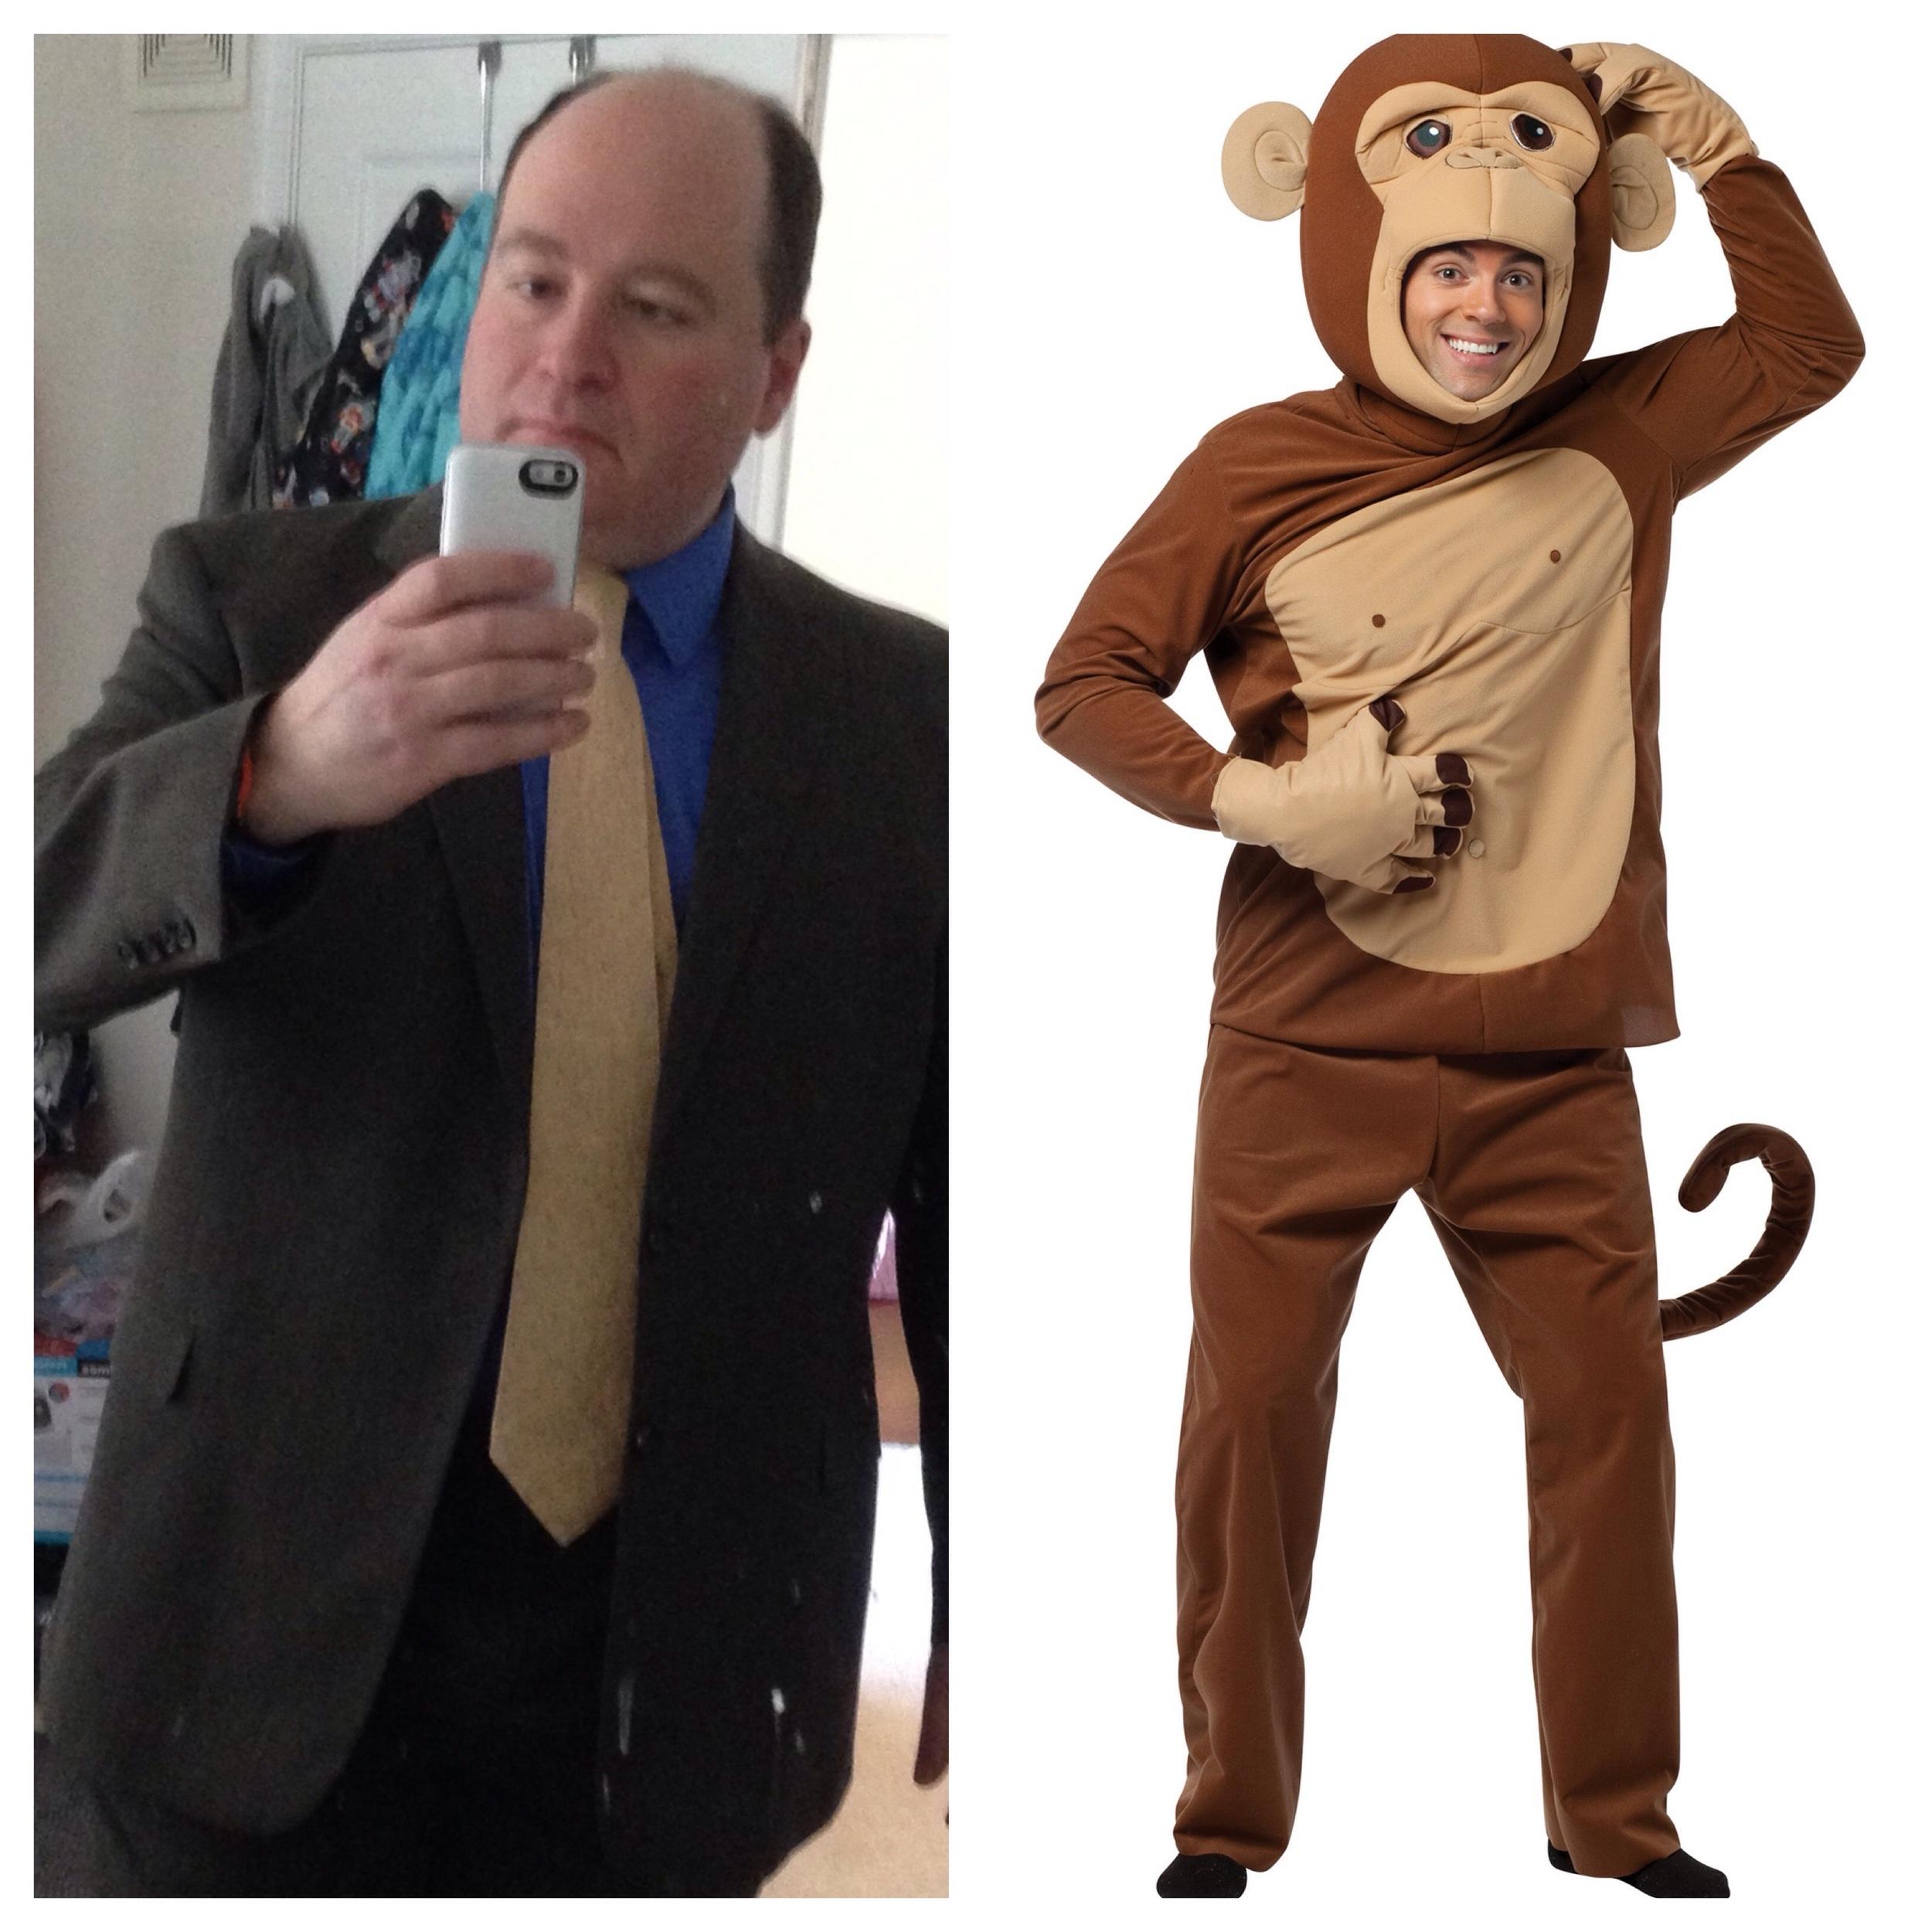 Not an ACTUAL monkey suit